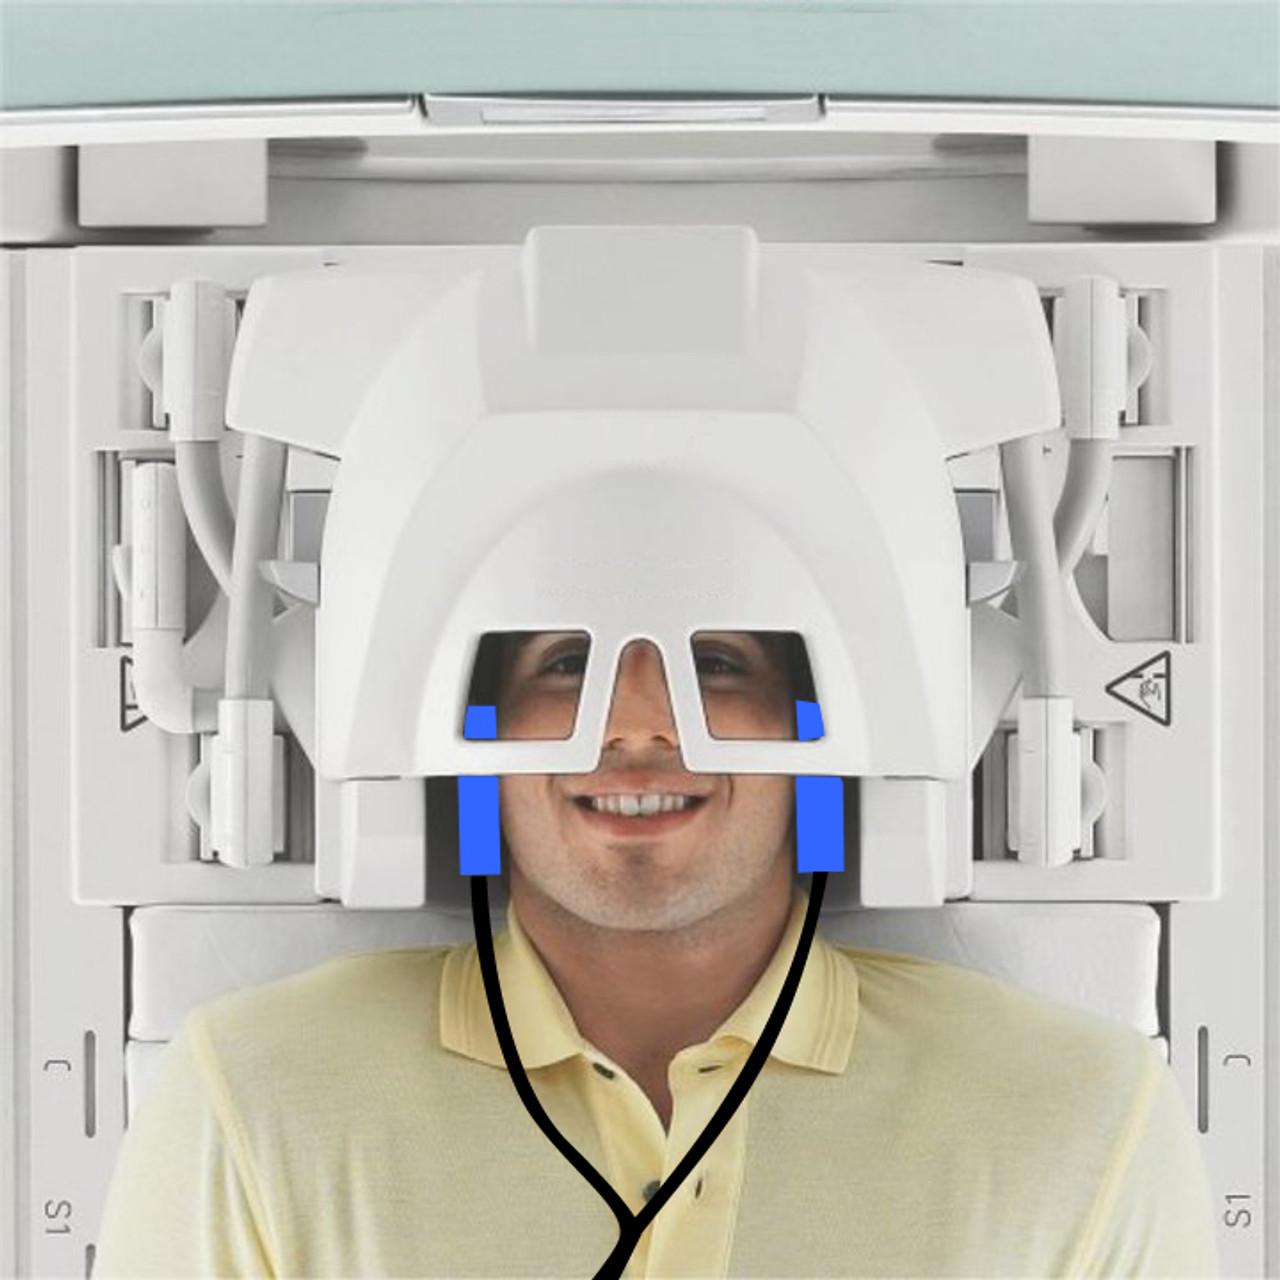 Acoustic Headphone Inside Brain Coil for MRI Music Systems